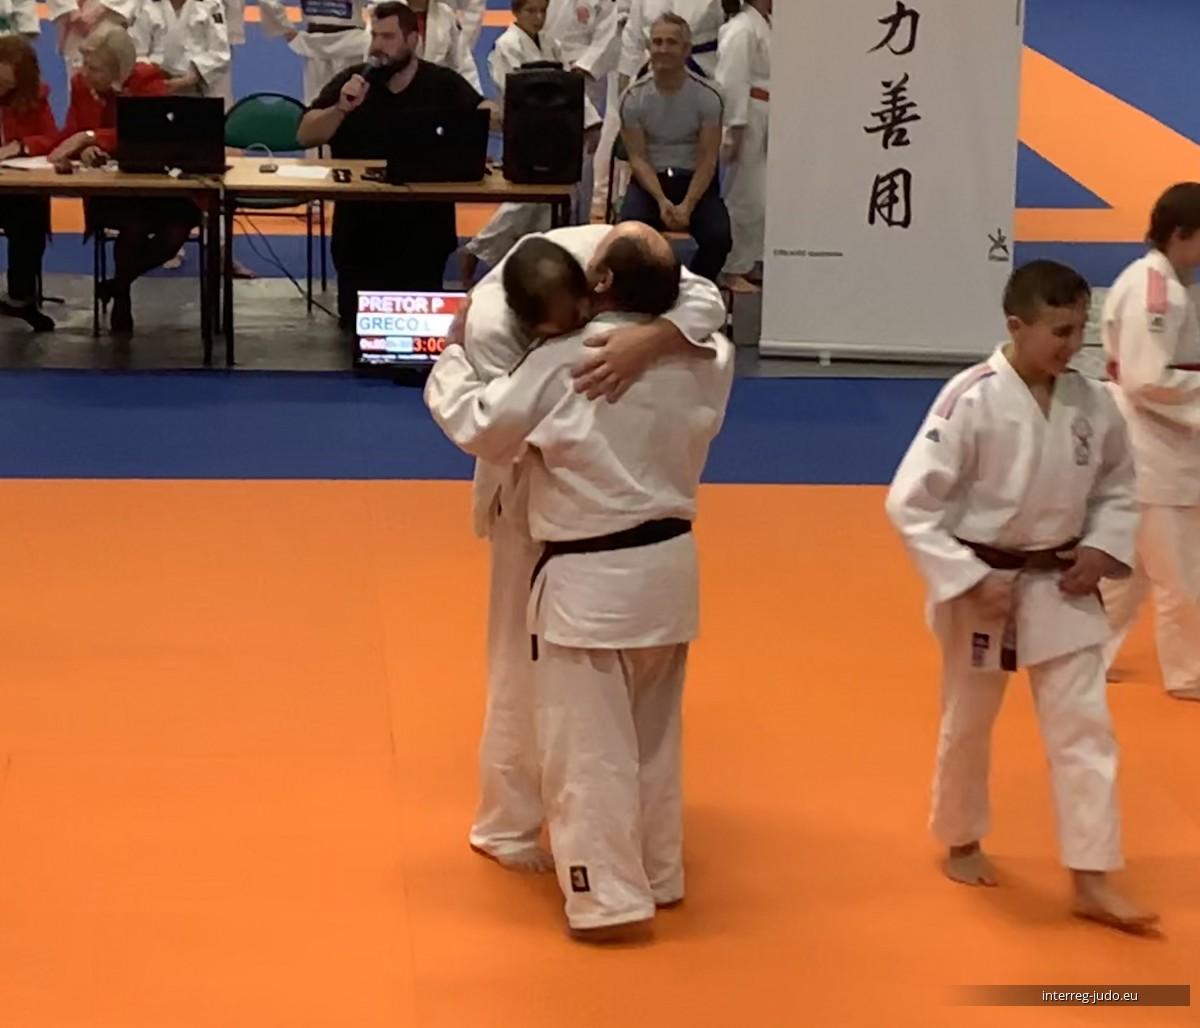 Pictures - U15 Interreg Judo Team Championships Amnéville 27.11.2019